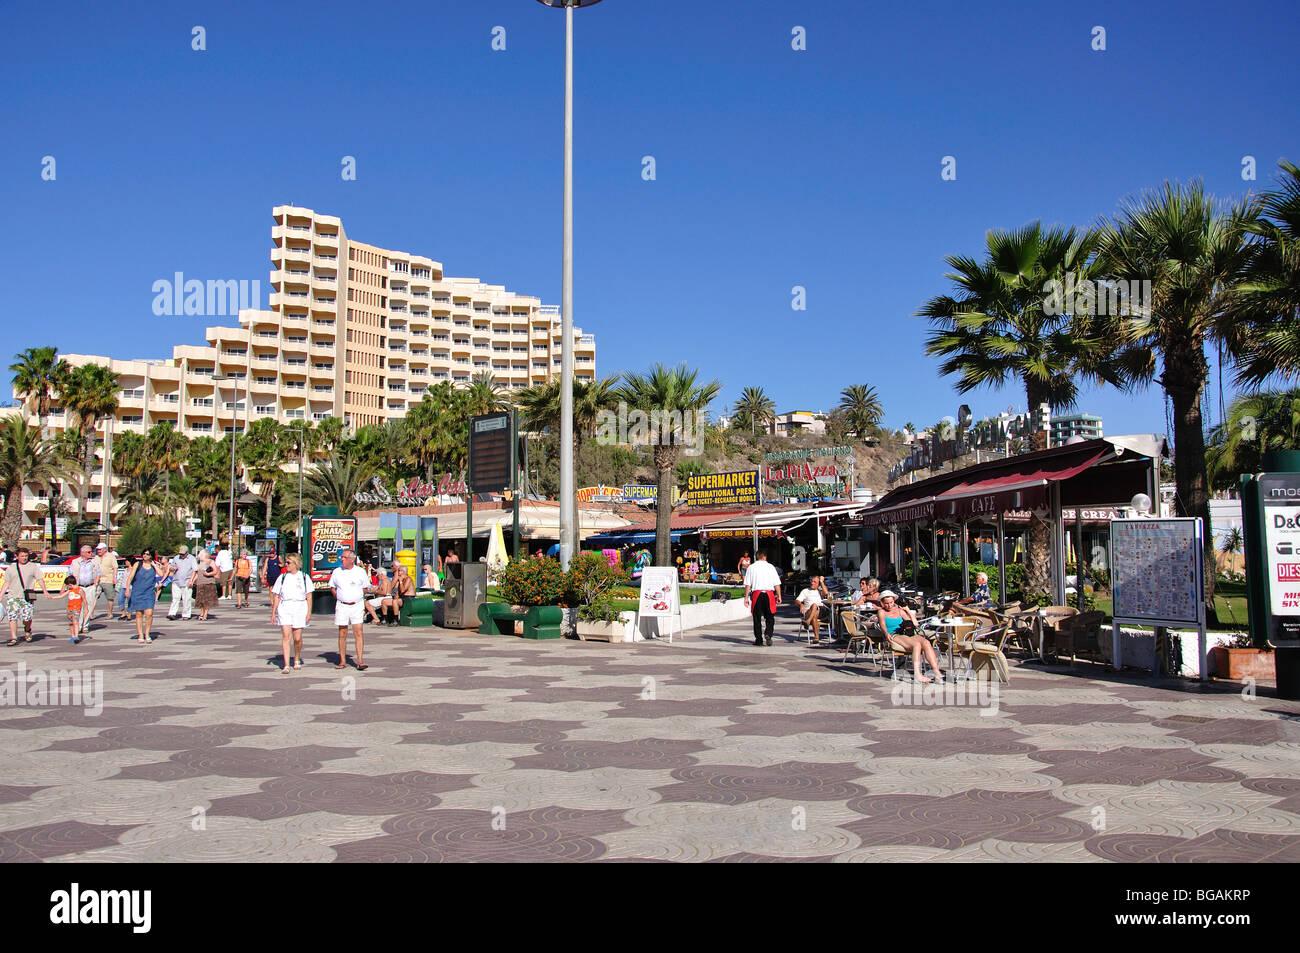 Strandpromenade, Playa del Ingles, Gran Canaria, Kanarische Inseln, Spanien Stockfoto